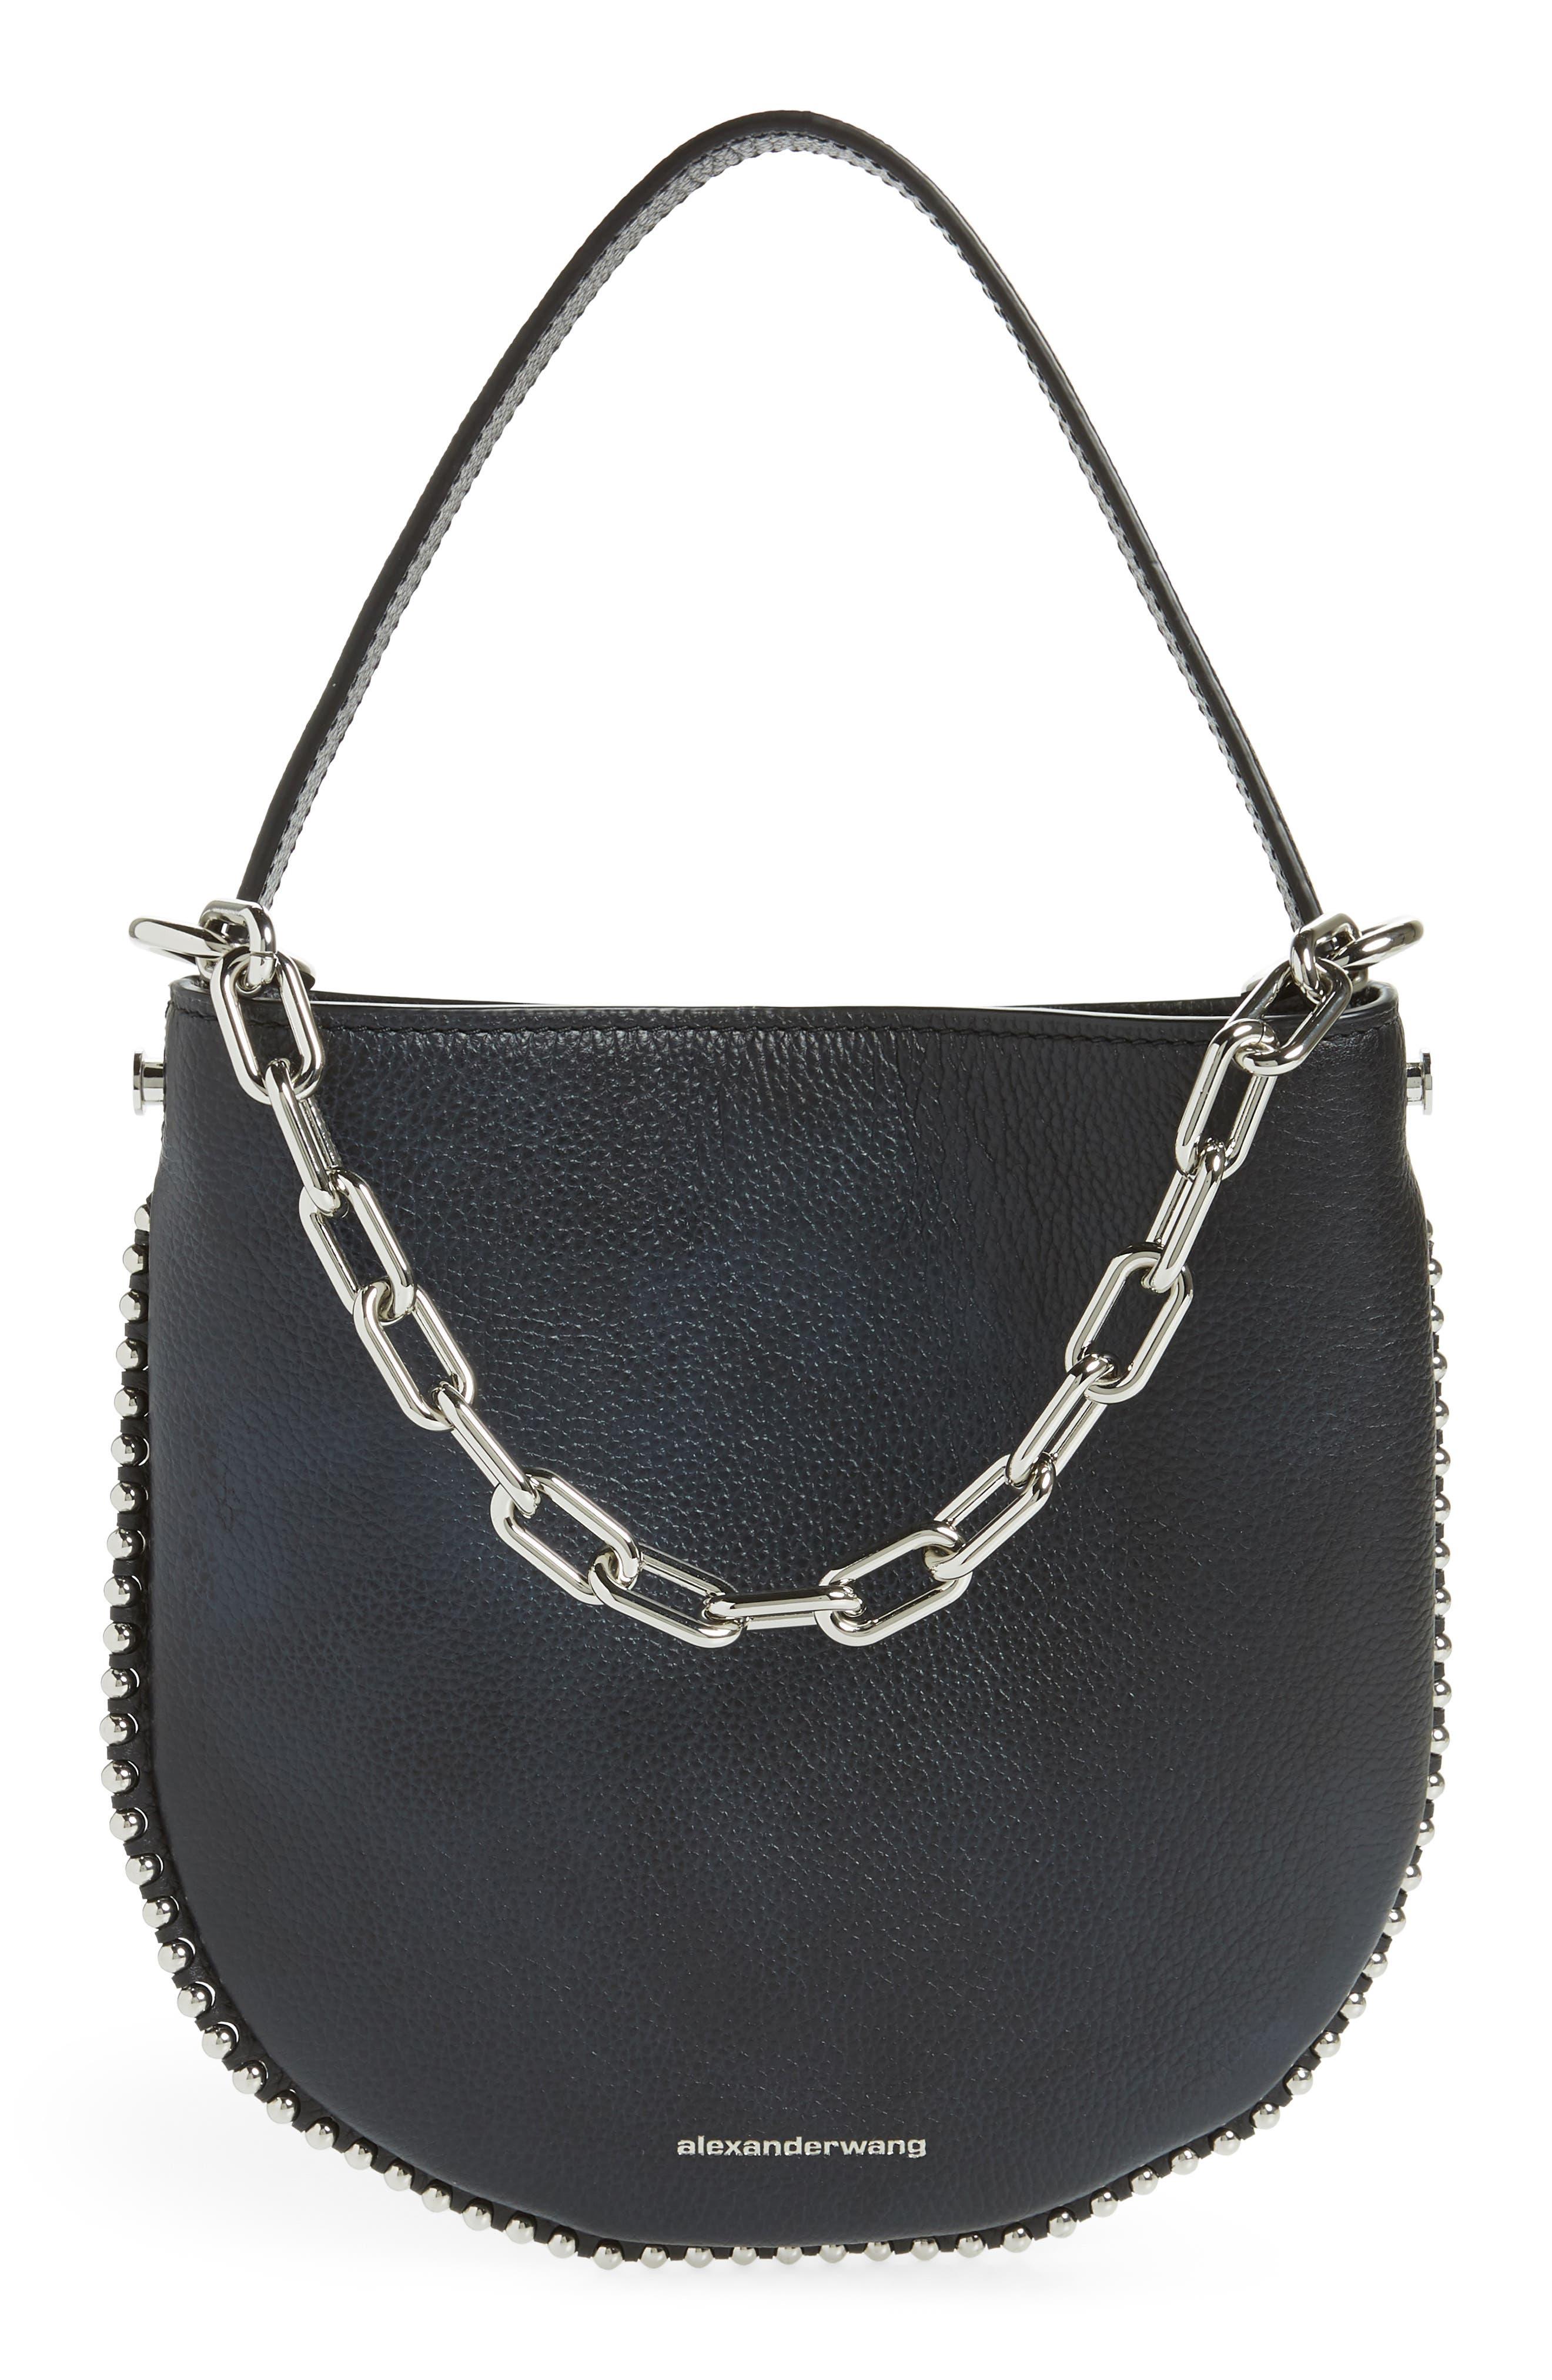 ALEXANDER WANG Mini Roxy Leather Hobo Bag, Main, color, BLACK/ WHITE